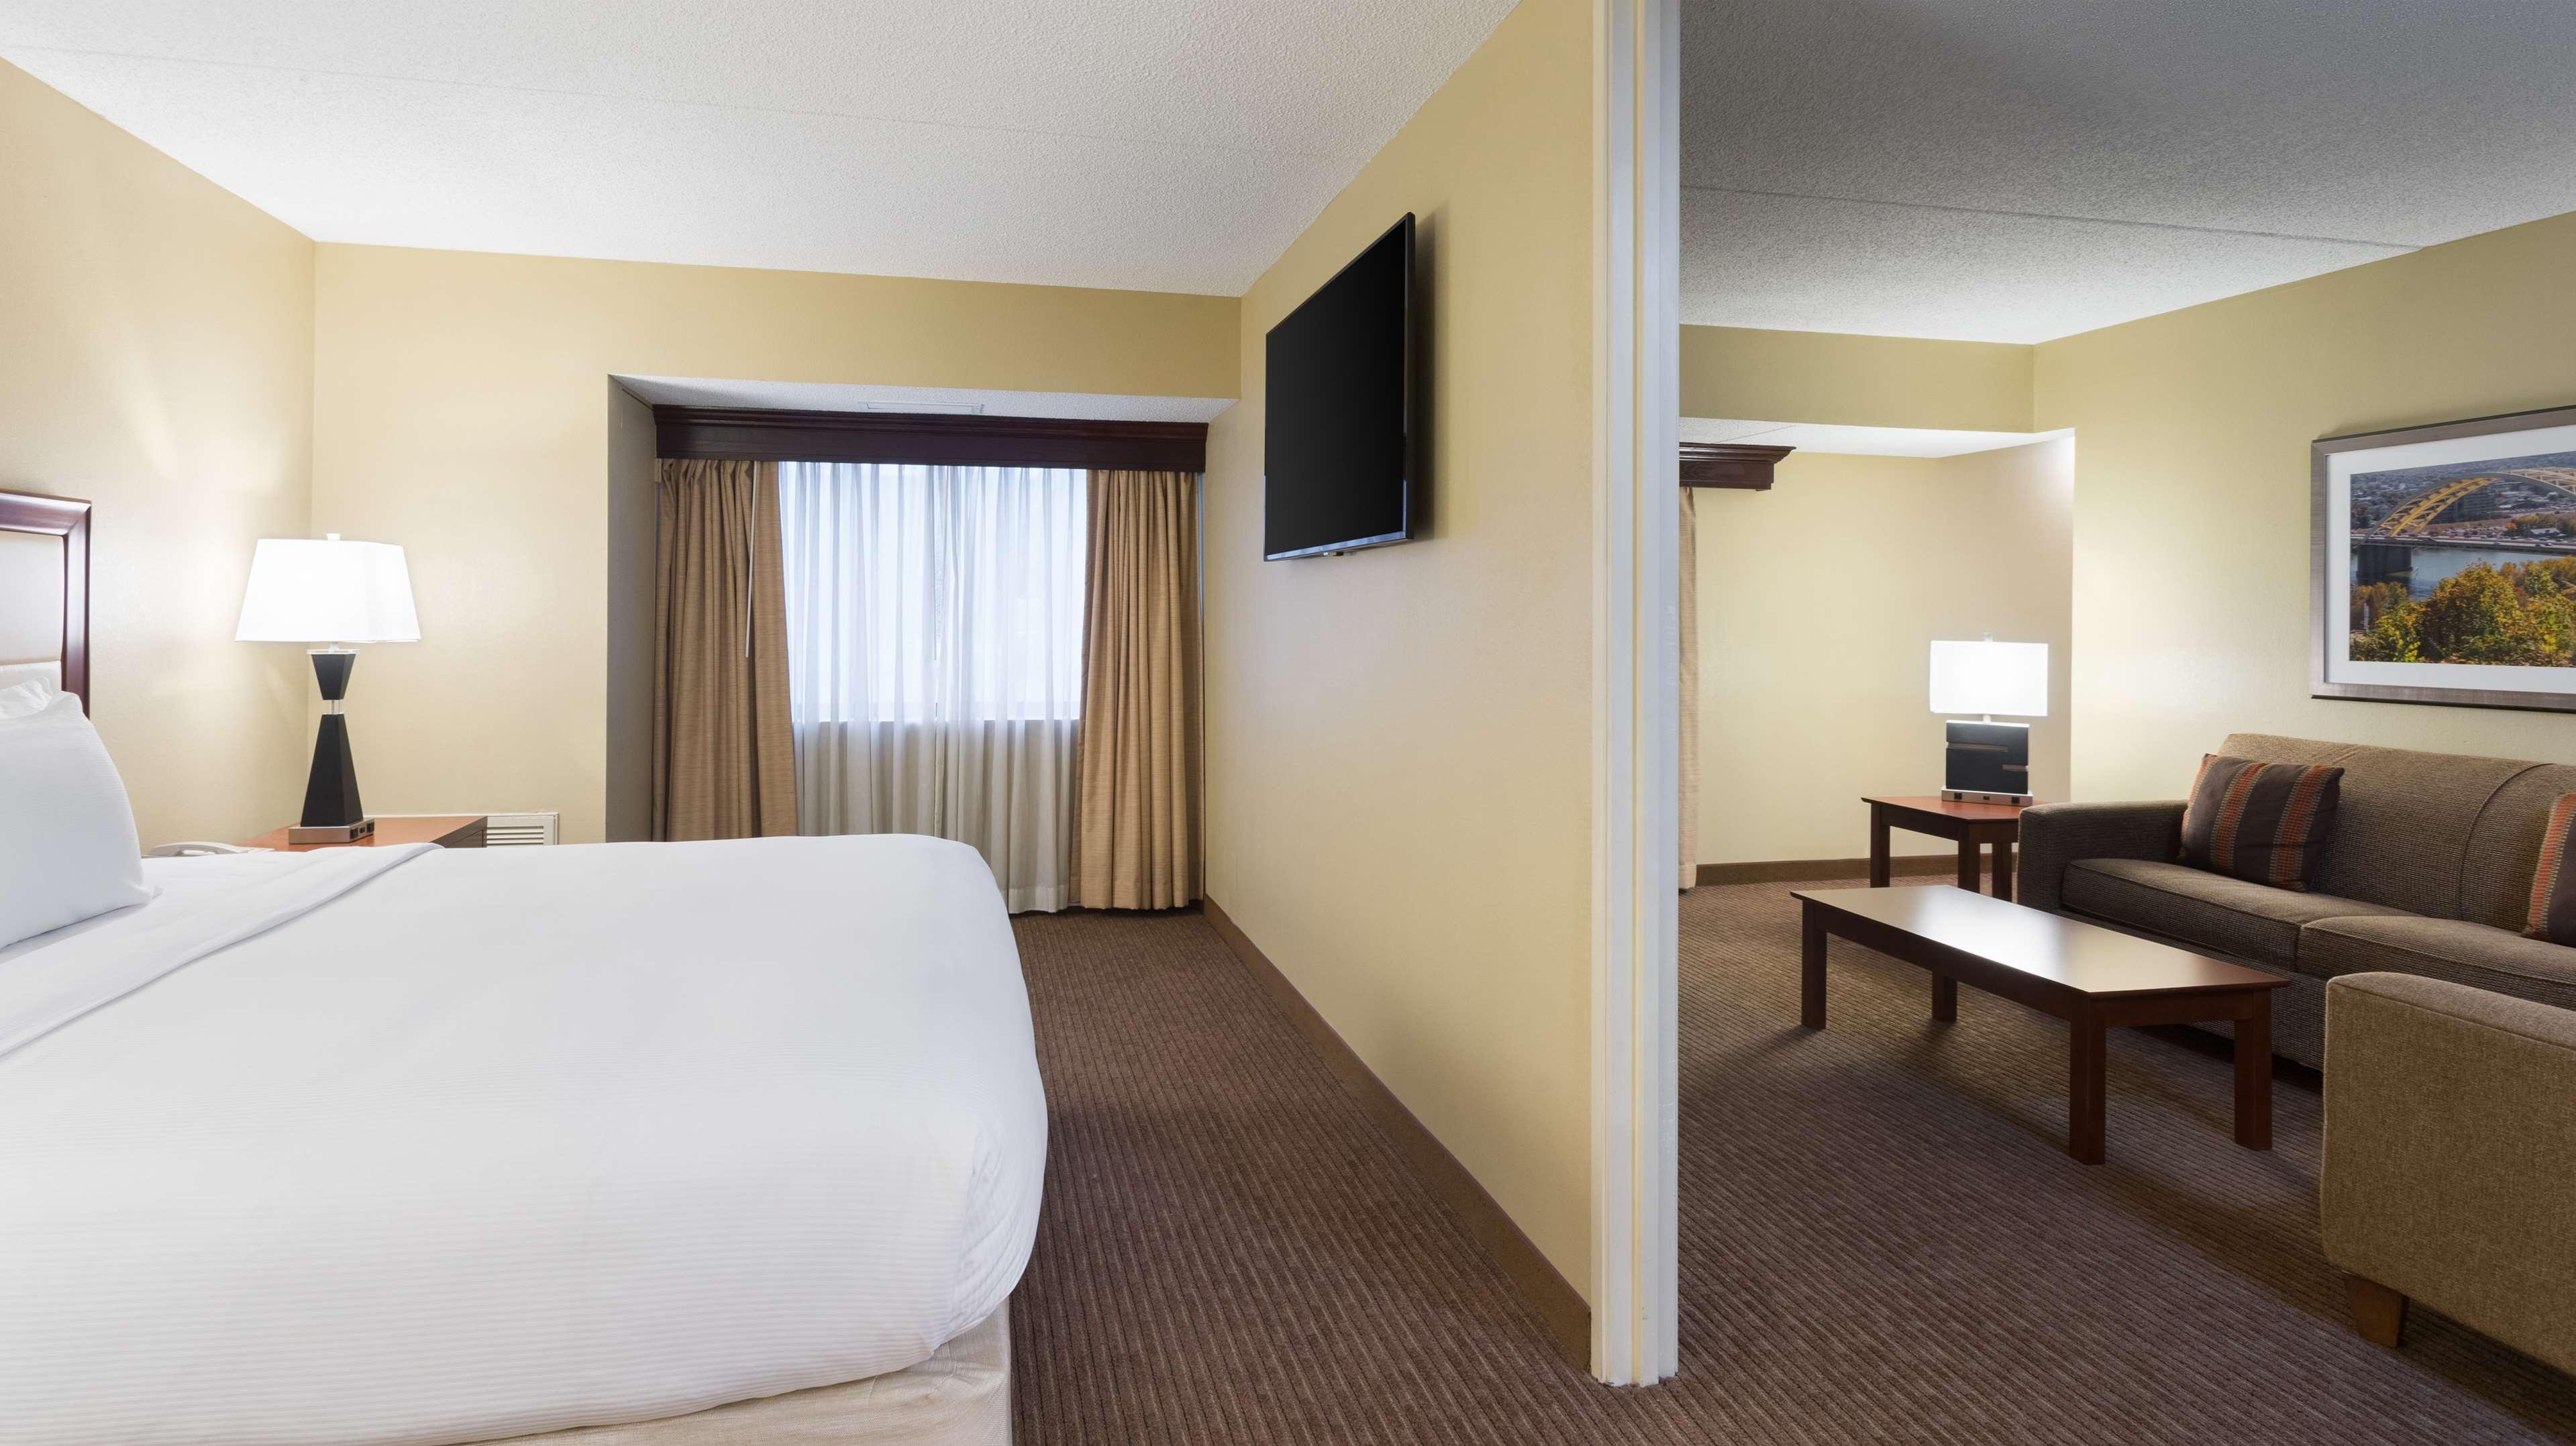 DoubleTree Suites by Hilton Hotel Cincinnati - Blue Ash image 29